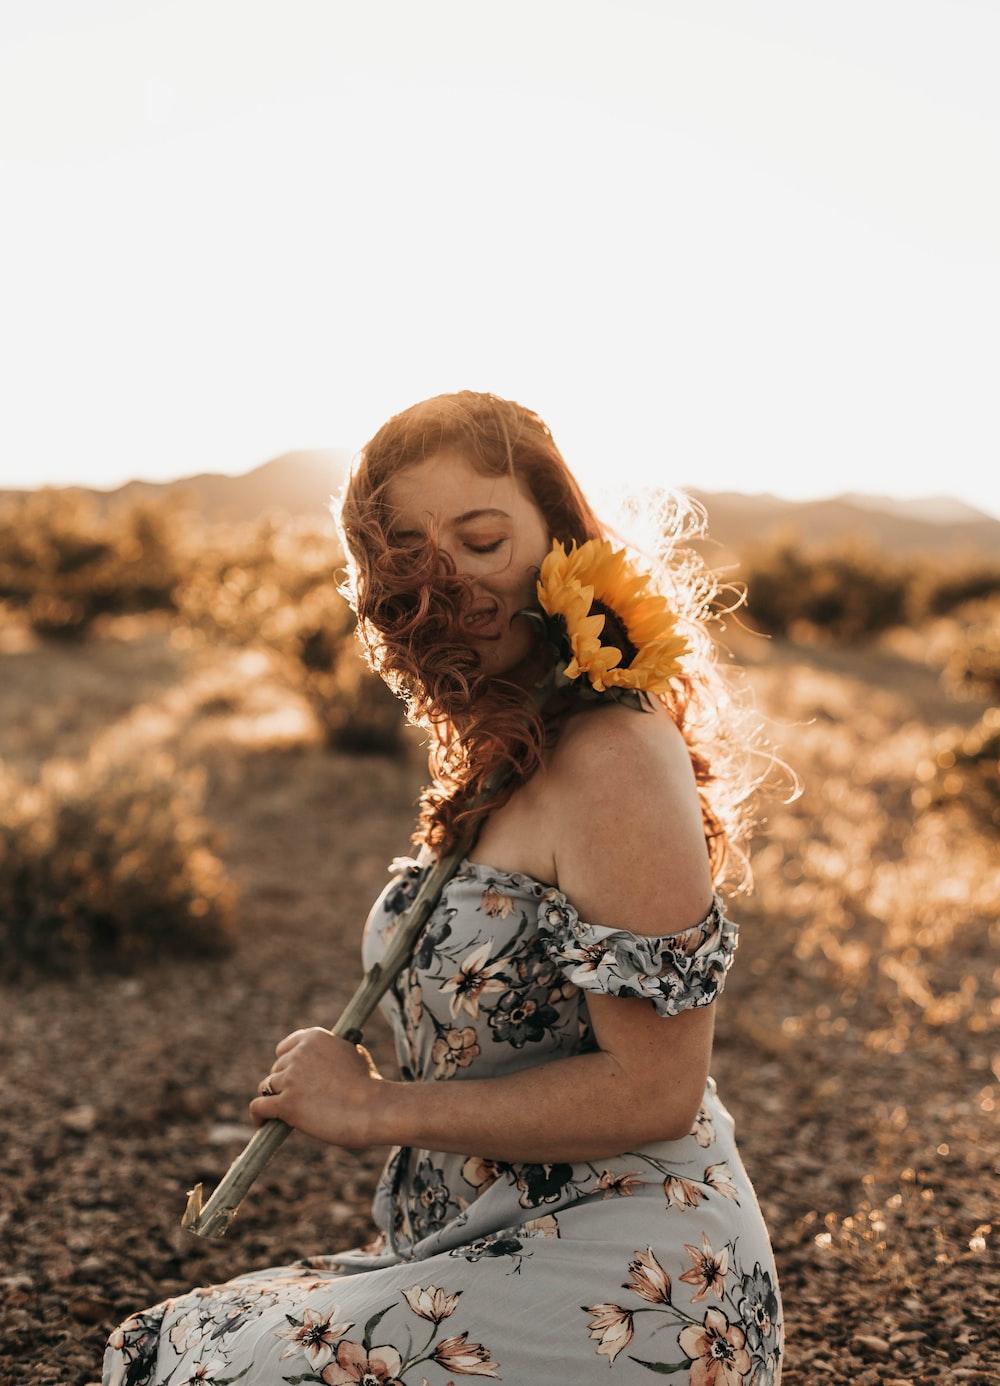 woman holding yellow sunflower sitting on ground